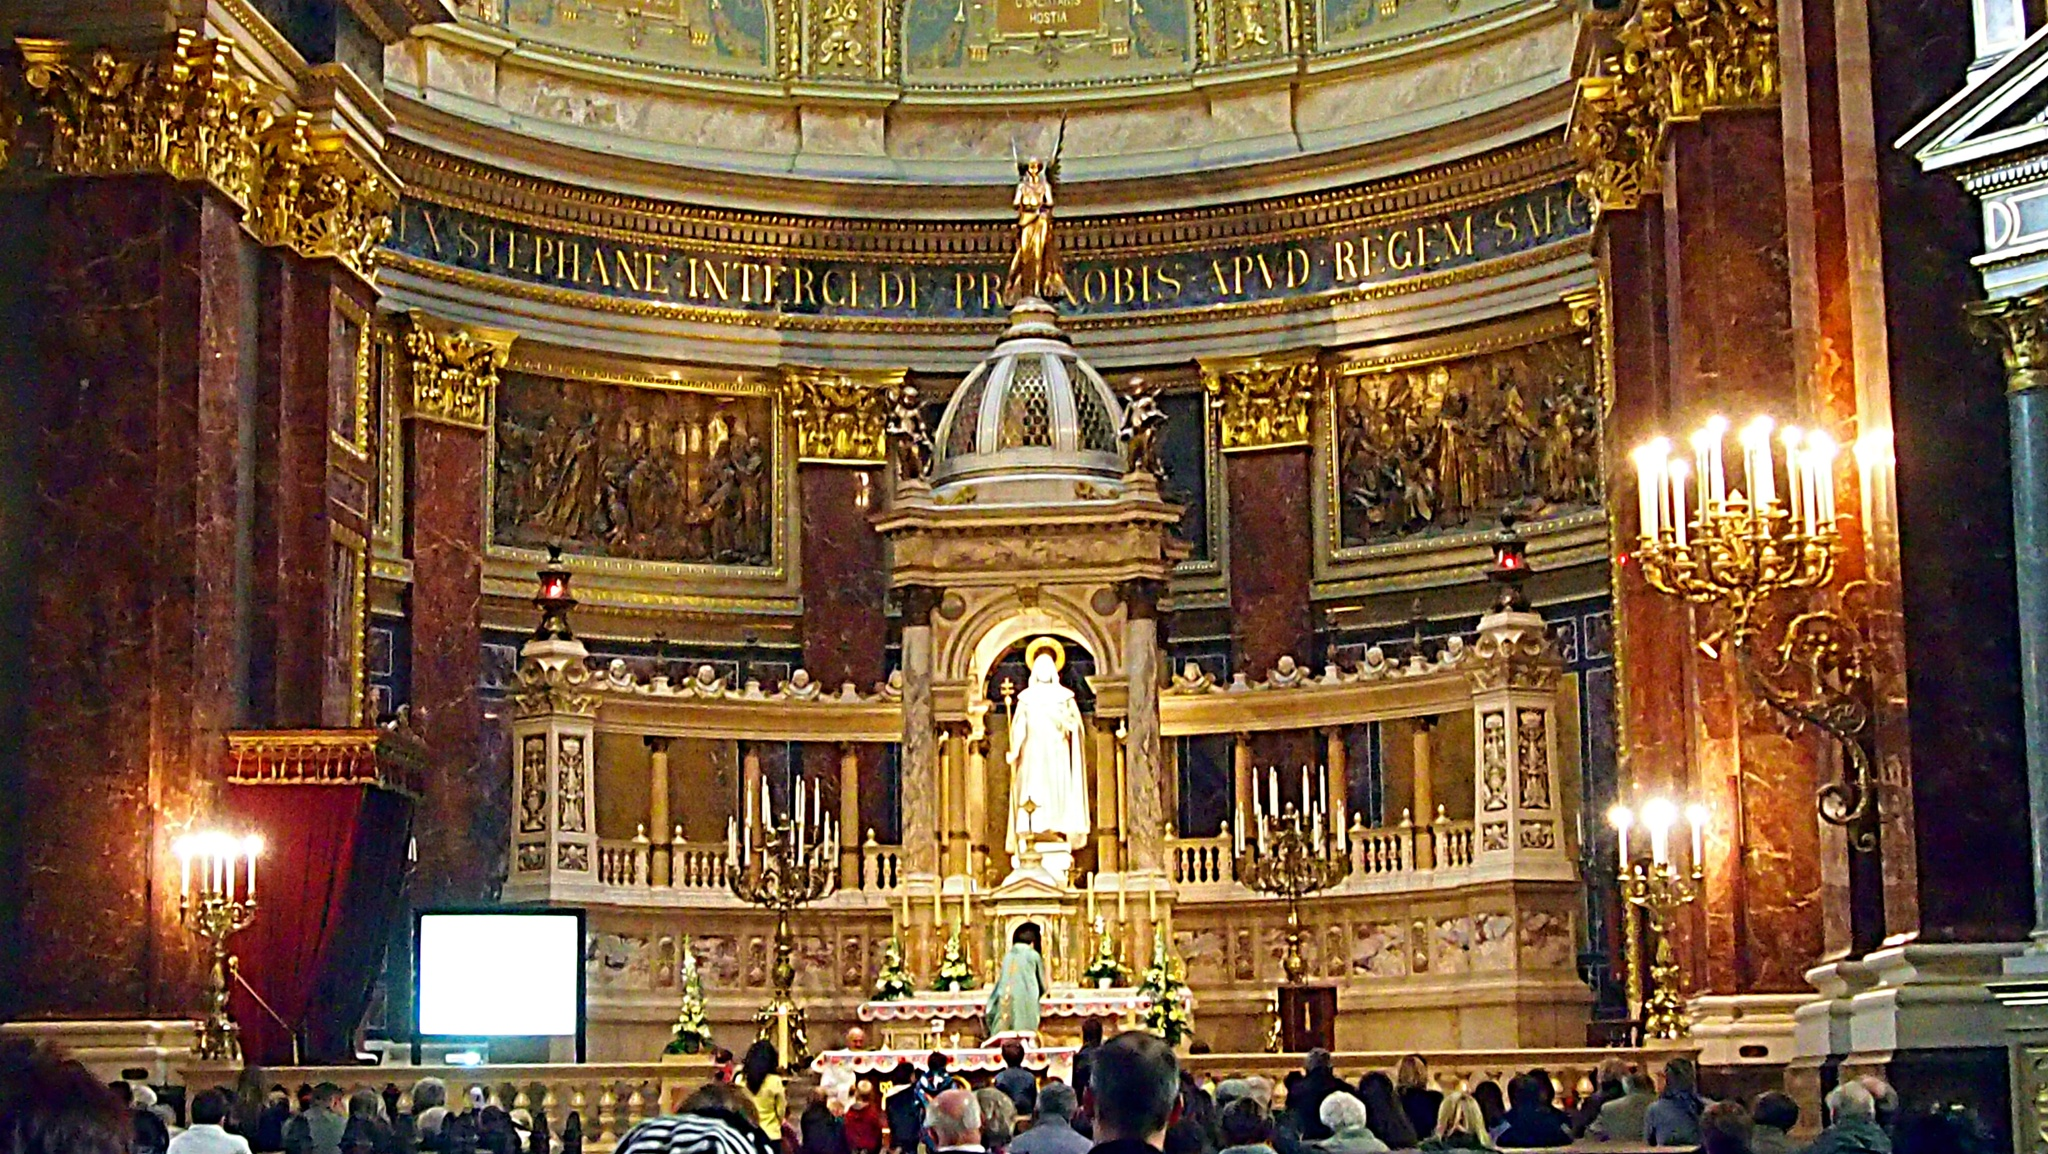 Inside the church by Rudy Tarrazona Guacena